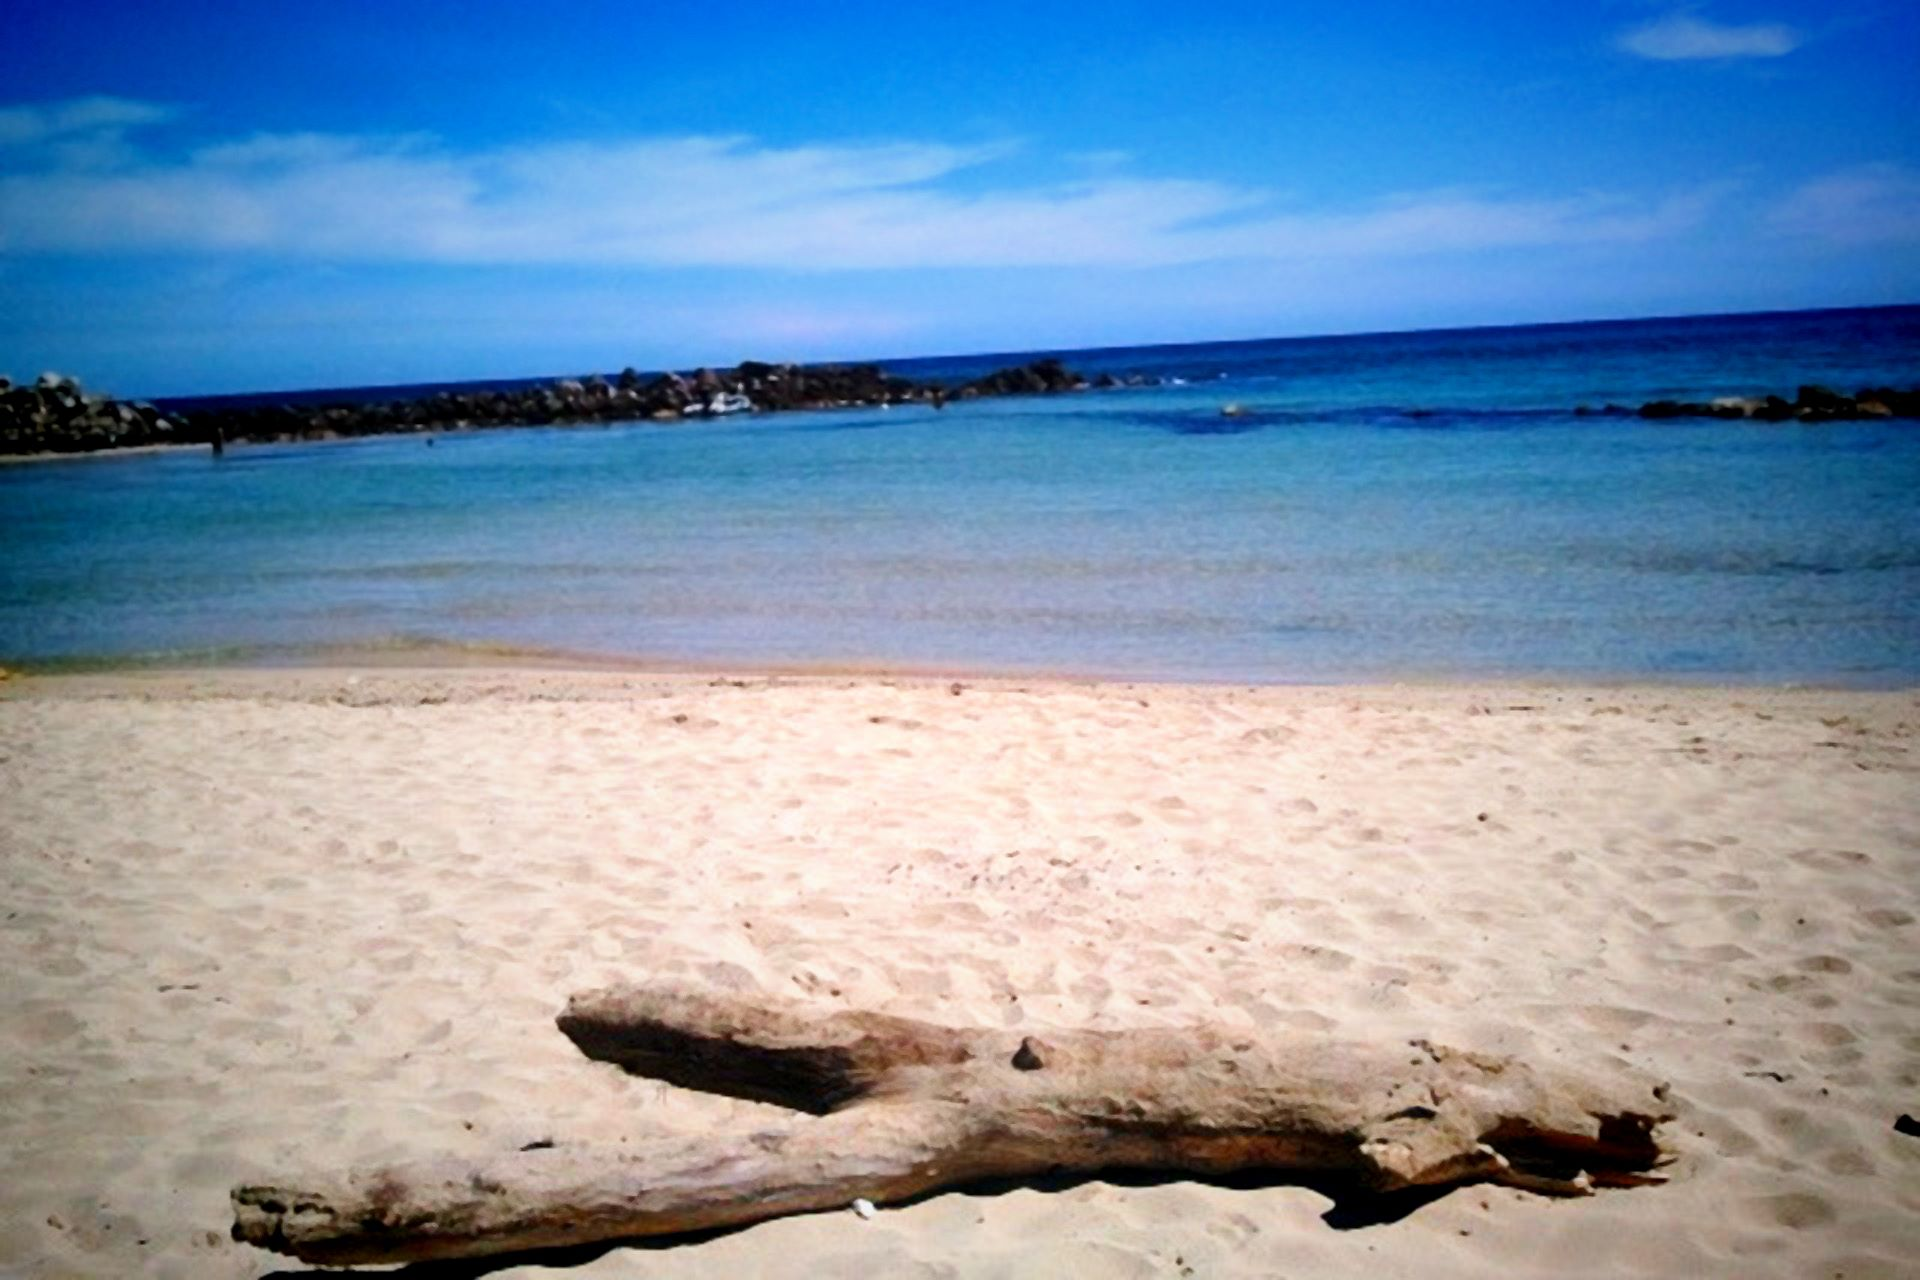 apulia-slow-travel-walking-tour-torre-guaceto-puglia-apulia-apulien-spatziergang-meer-mare-ocean-sea-sand-sabbia-holiday